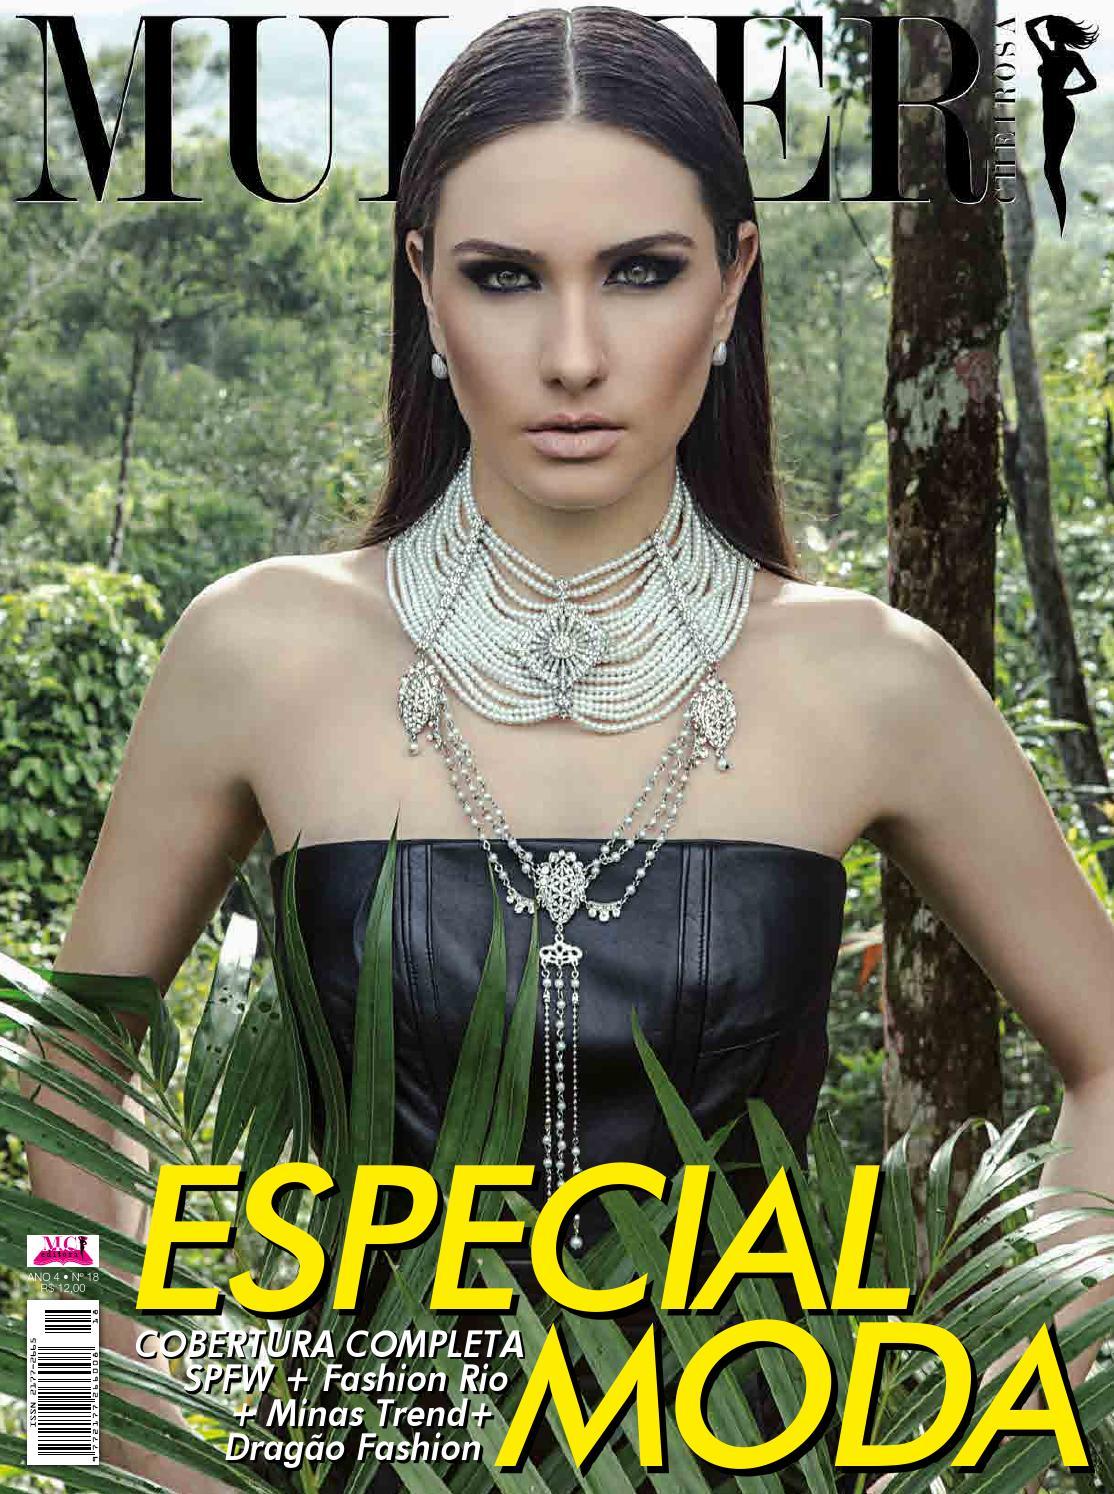 Revista mulher cheirosa 18ª edição by Clube Fiel - issuu a4a6f6d292